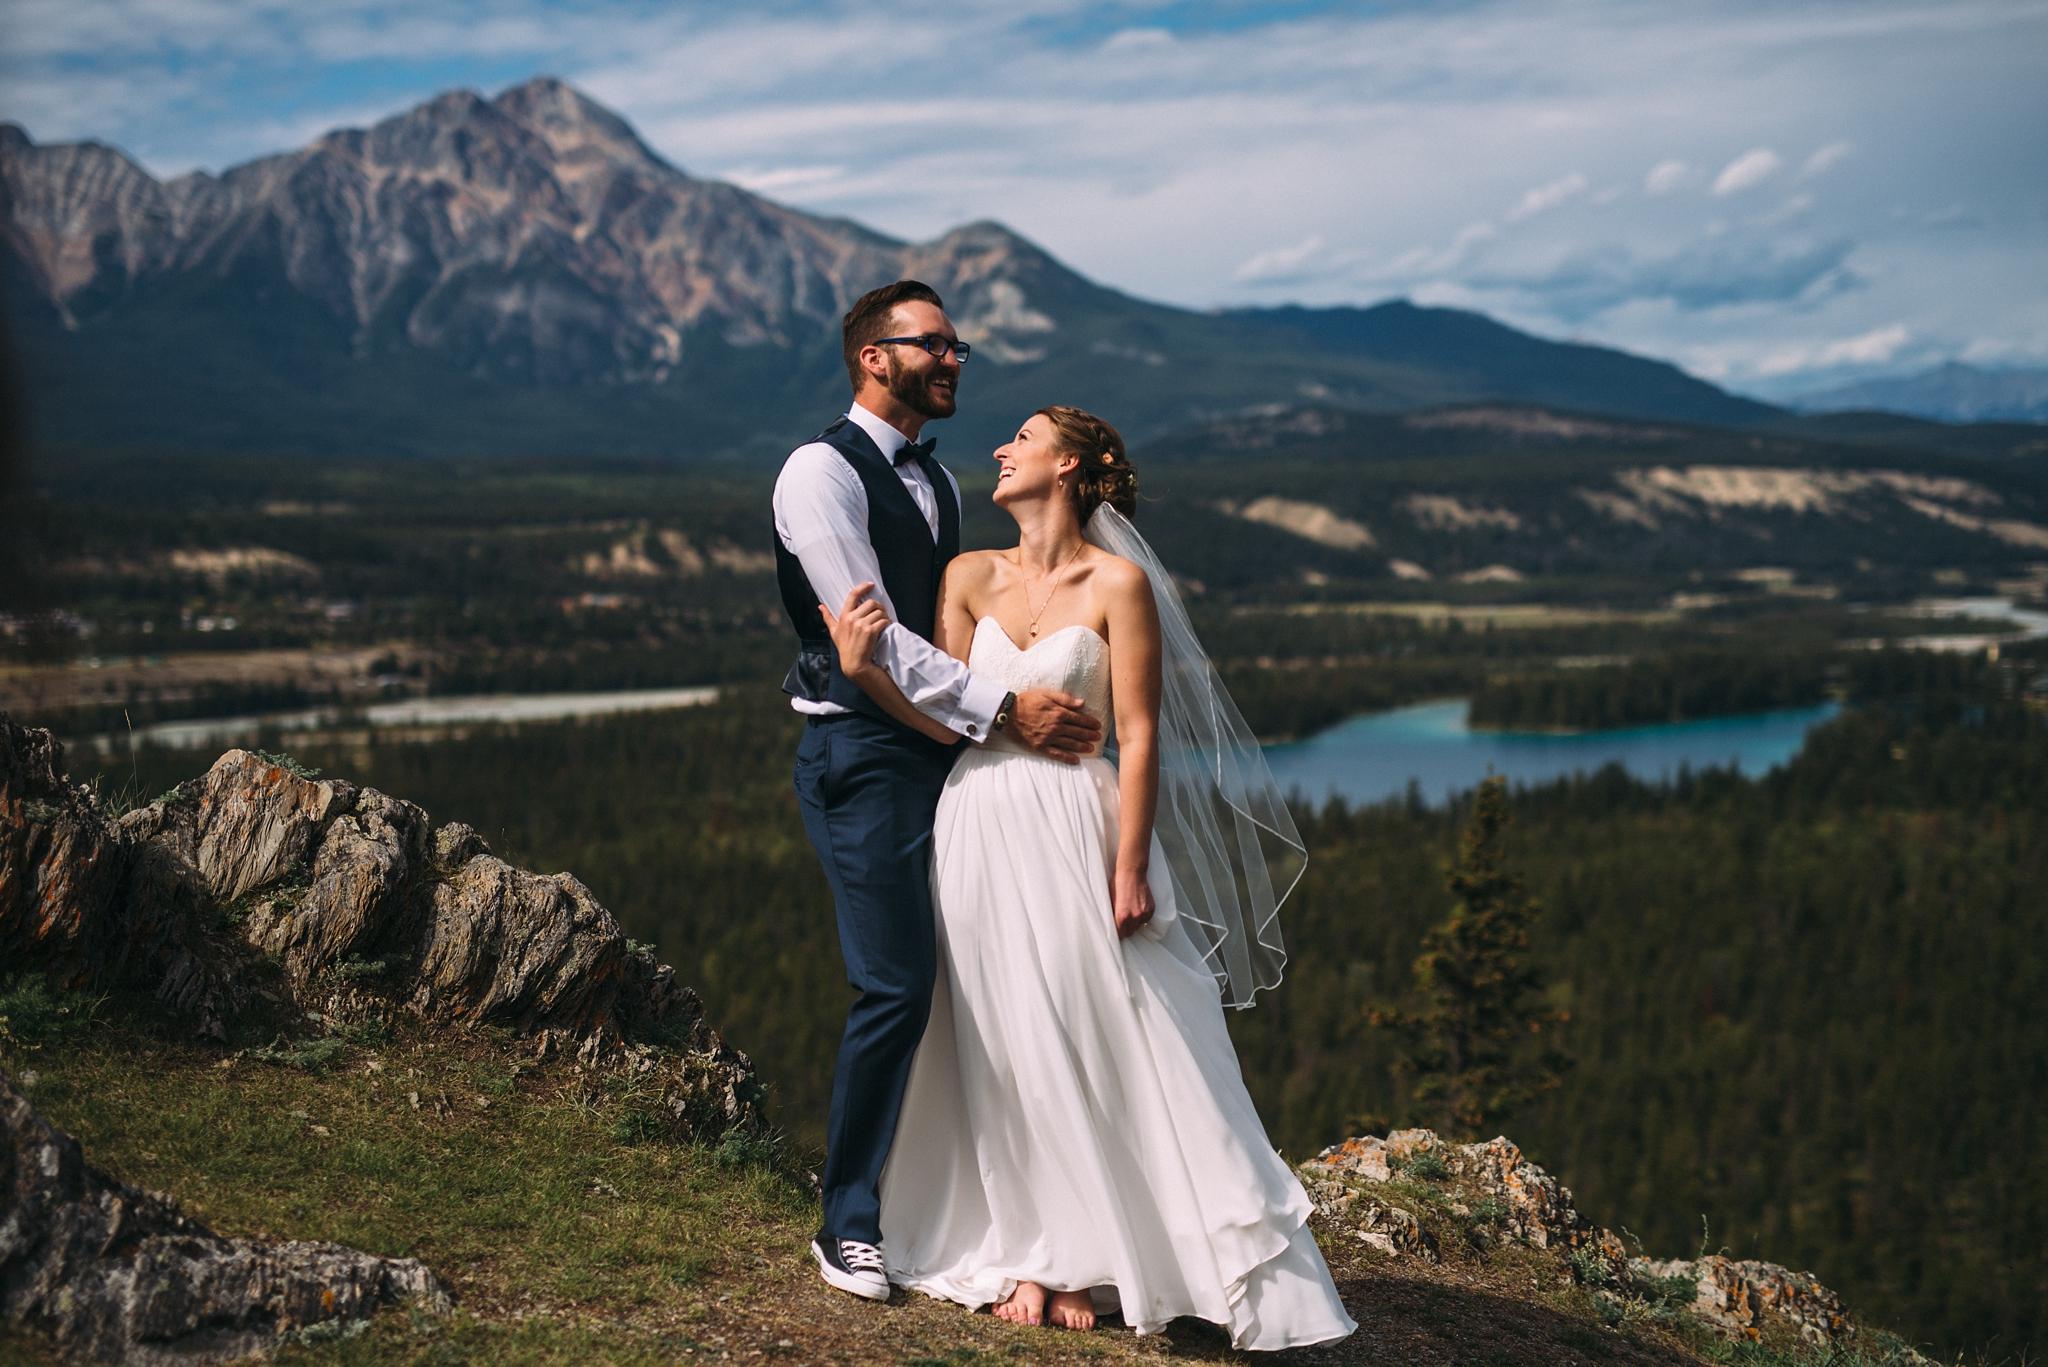 kaihla_tonai_intimate_wedding_elopement_photographer_2489